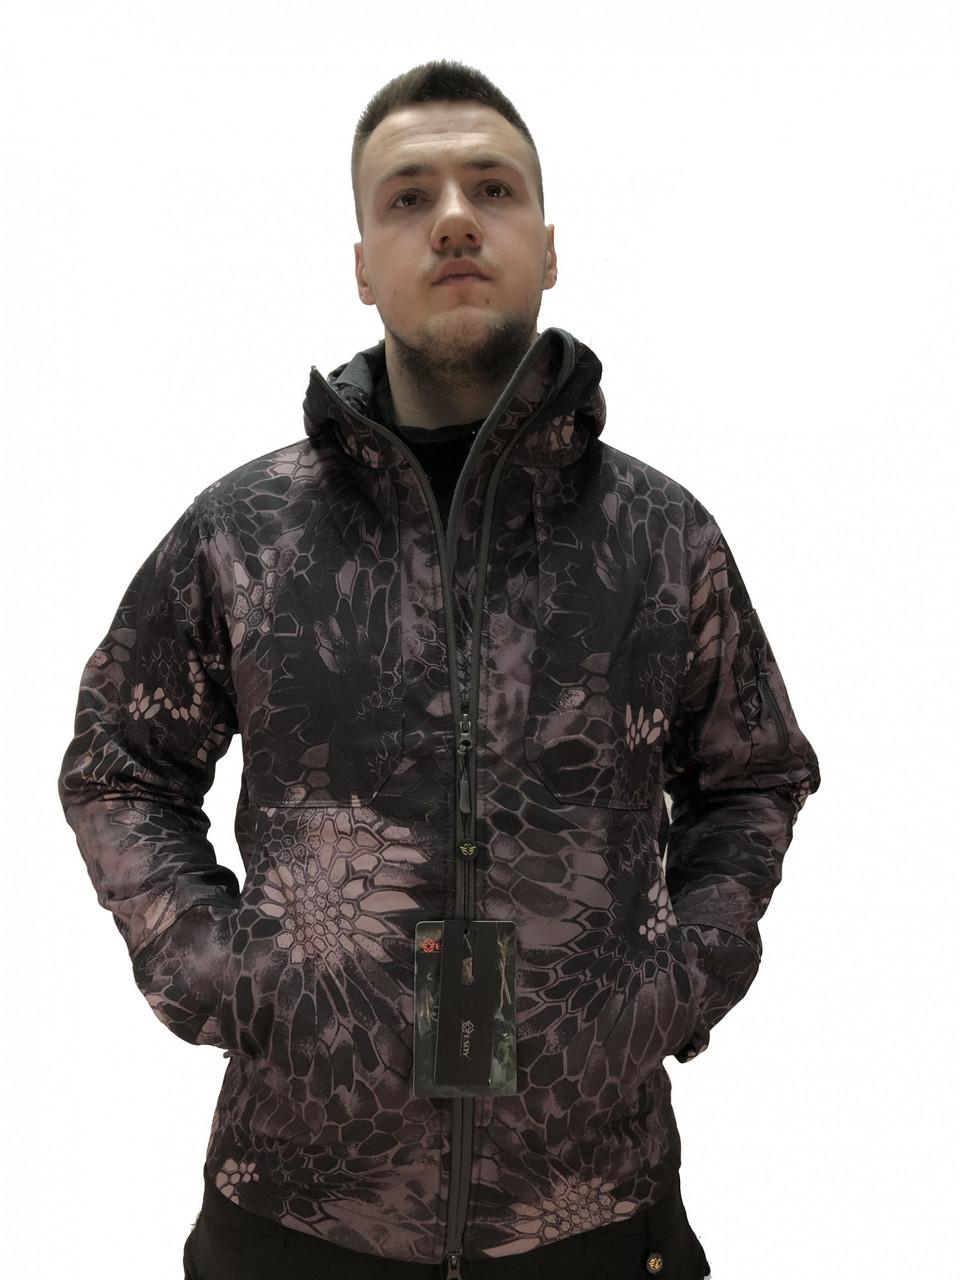 Тактична куртка Softshell Urban 03. ESDY. 2 внутр кармани. Кріптек